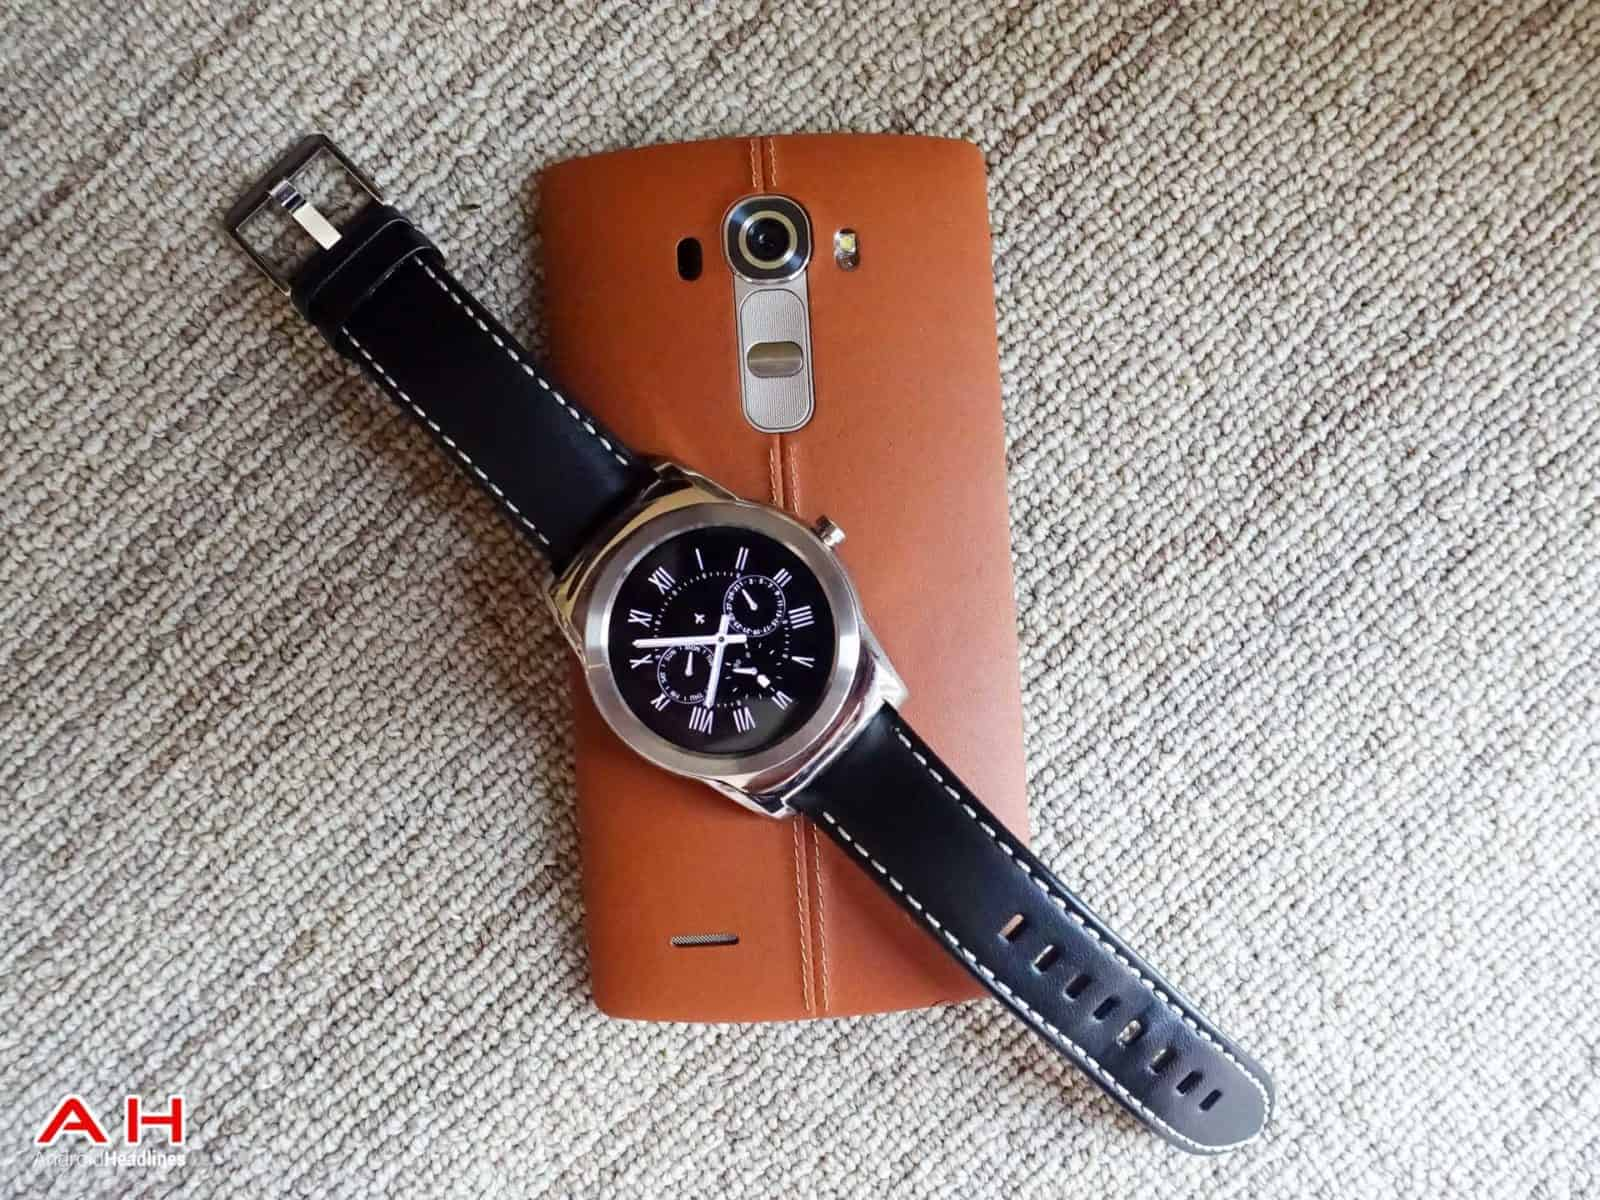 LG-Watch-Urbane-Review-AH-1